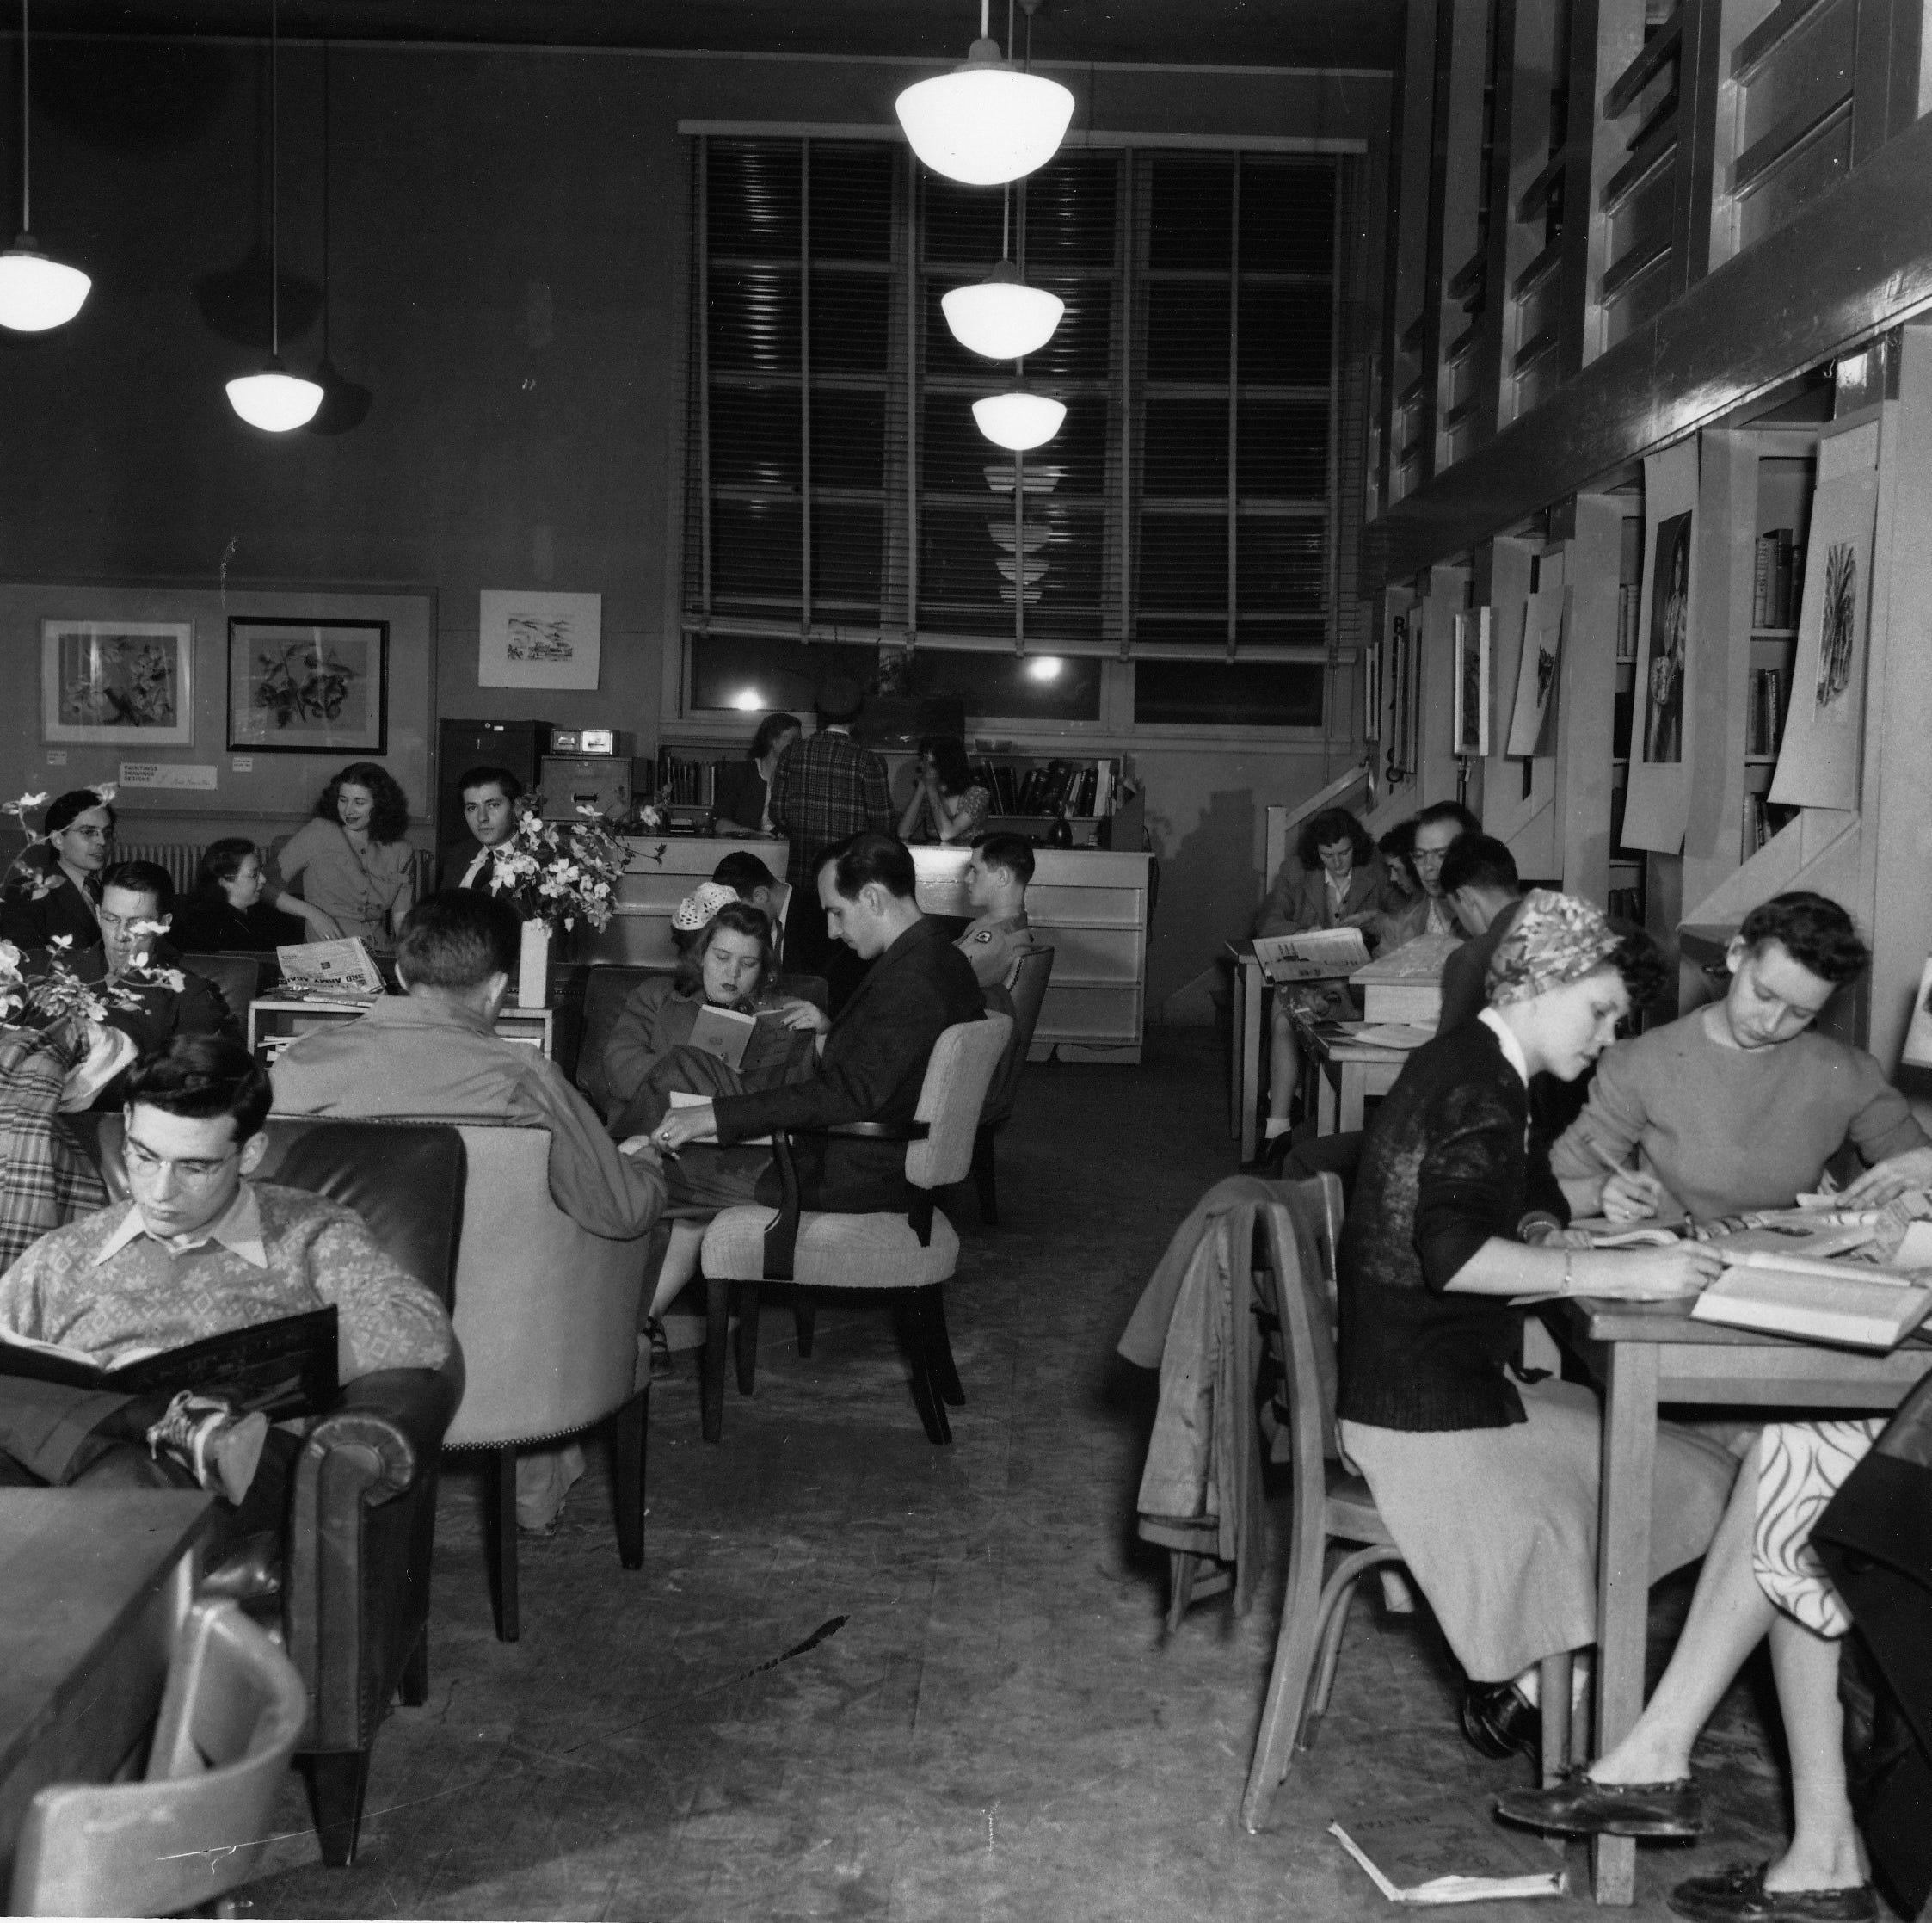 How did Oak Ridge remain a secret during wartime?